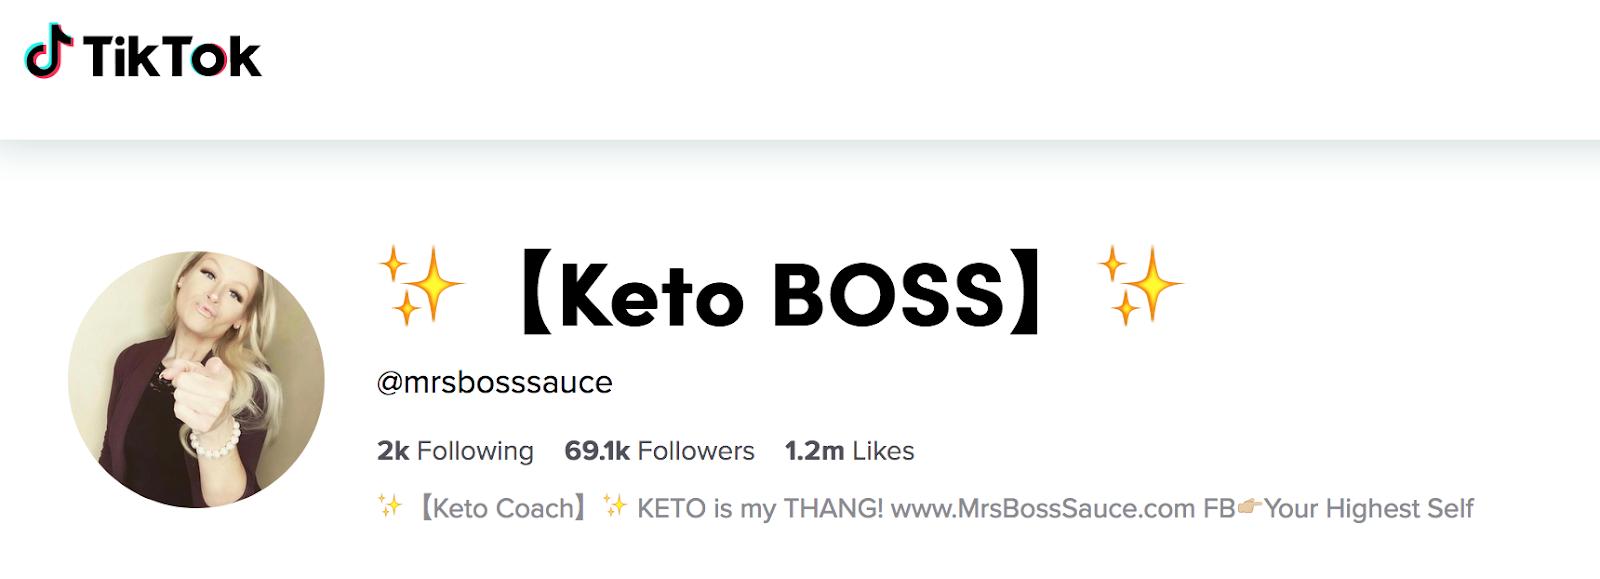 Mrs. Boss Sauce | Keto Health Influencer